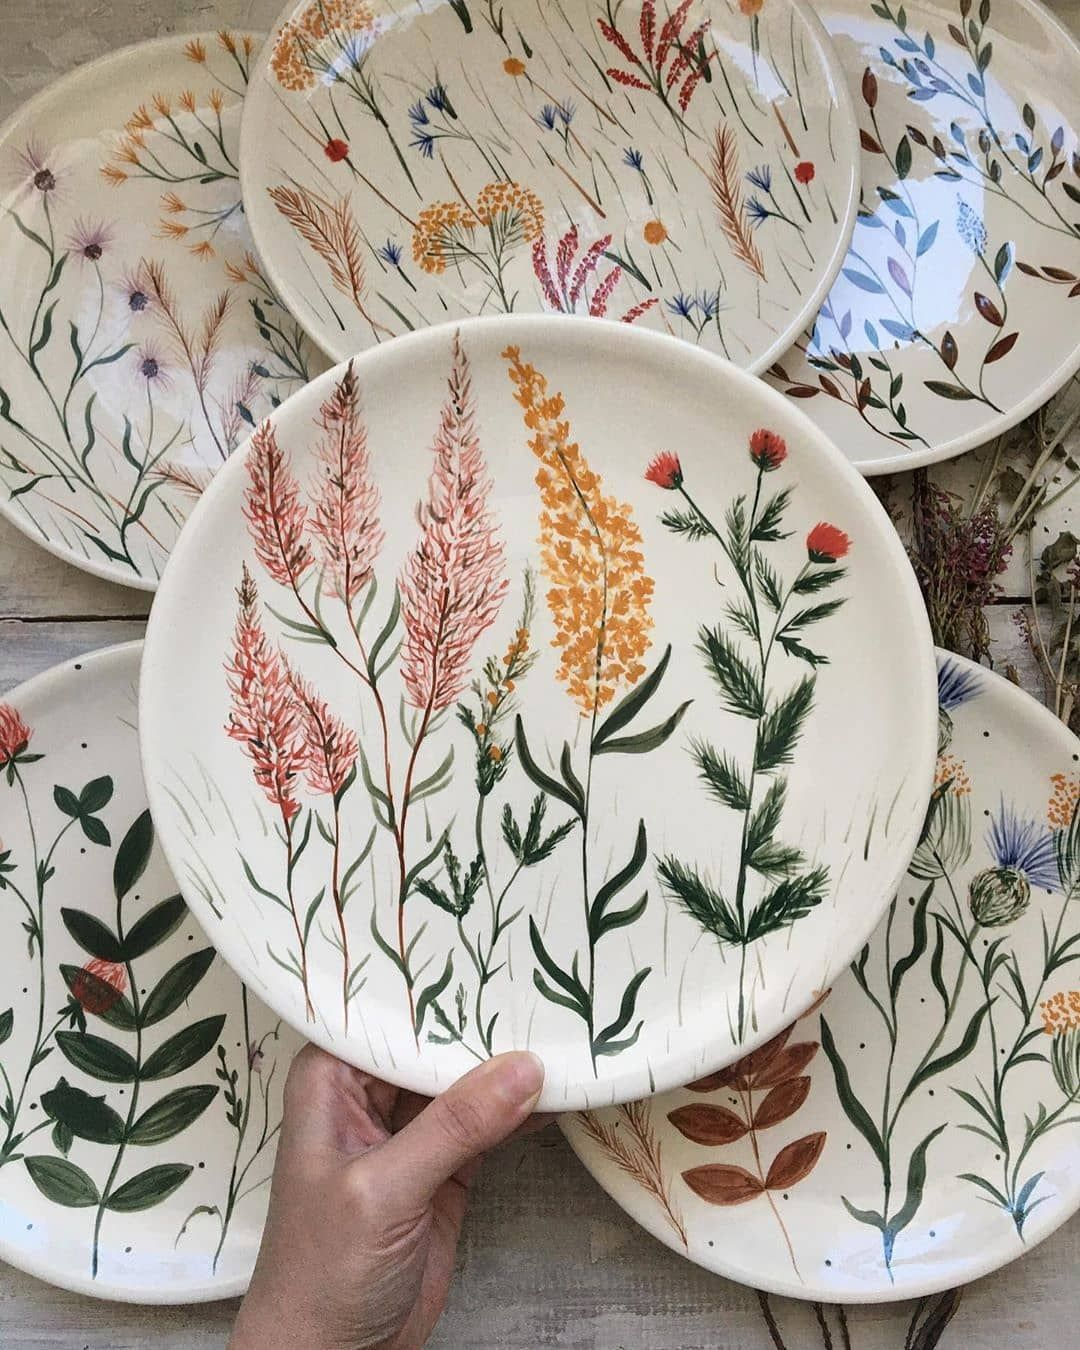 "@ceramic.is.love on Instagram: ""From @jlv_ceramics 🌿🌱👌 . . . . . #ceramic #ceramiclove #ceramicart #ceramiclife #ceramica #ceramique #ceramicdesign #design #art #artdesign…"""